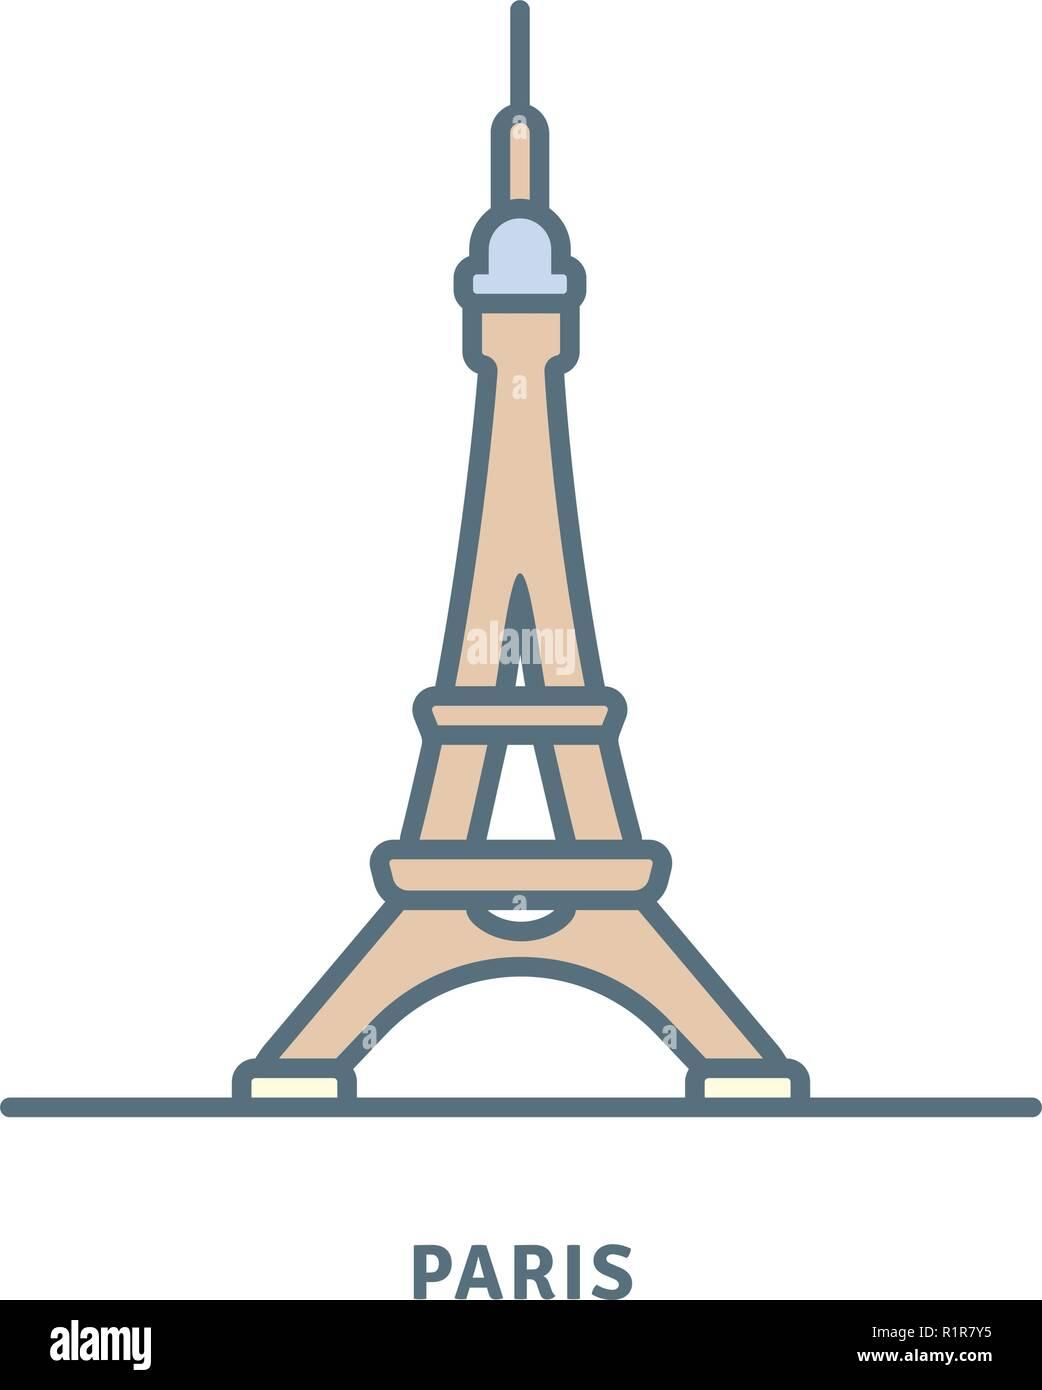 Paris line icon. Eiffel Tower vector illustration. - Stock Vector